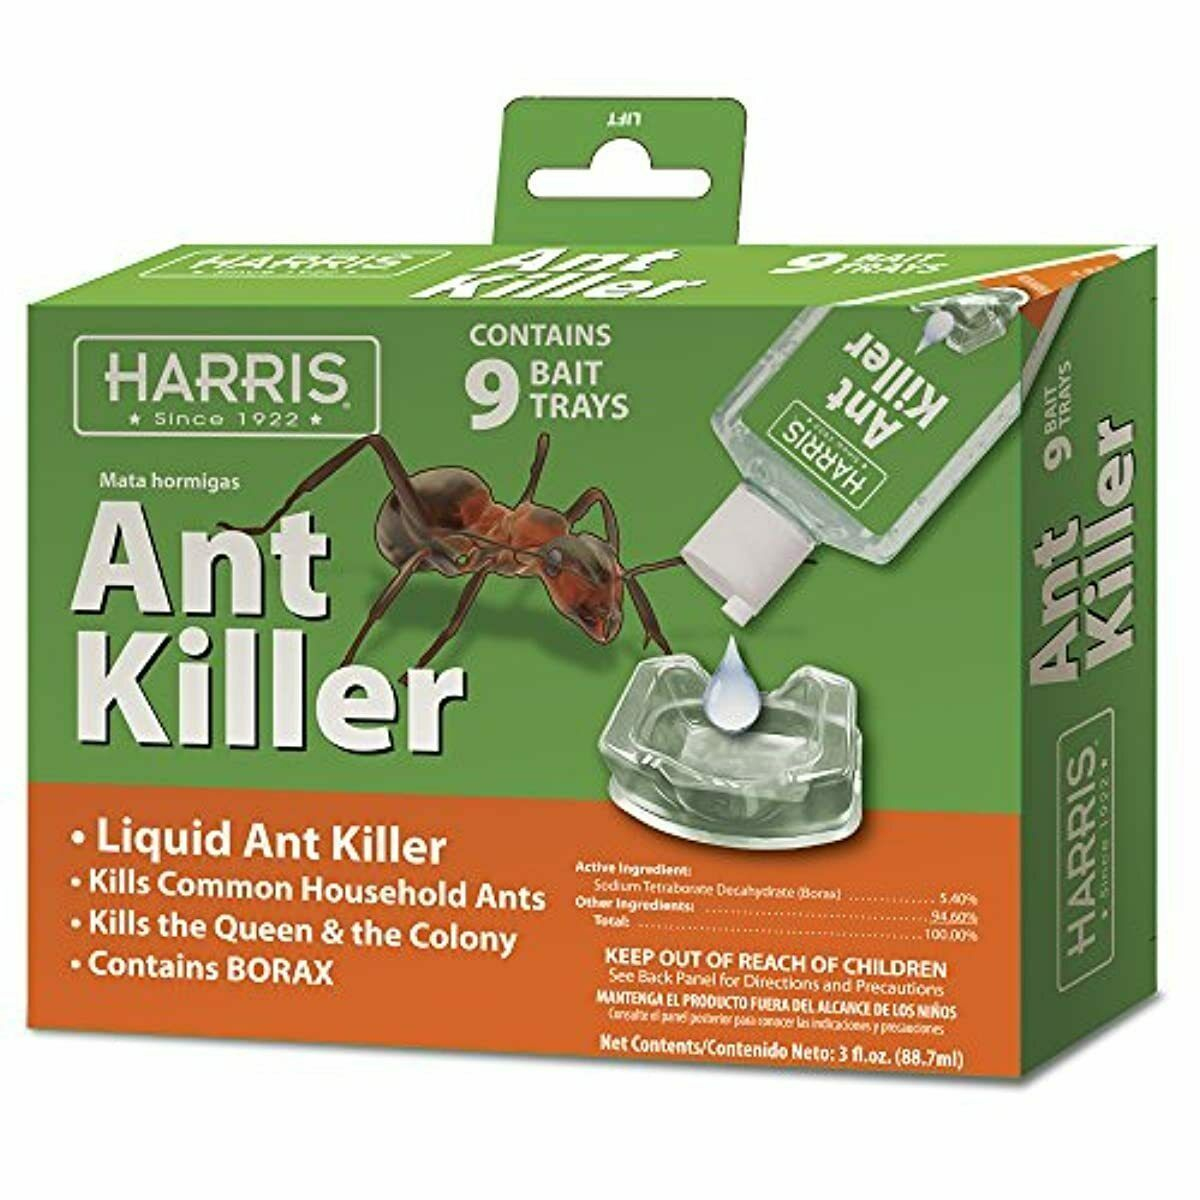 HARRIS Ant Killer 3oz Liquid Borax Value Pack Includes 9 Bai